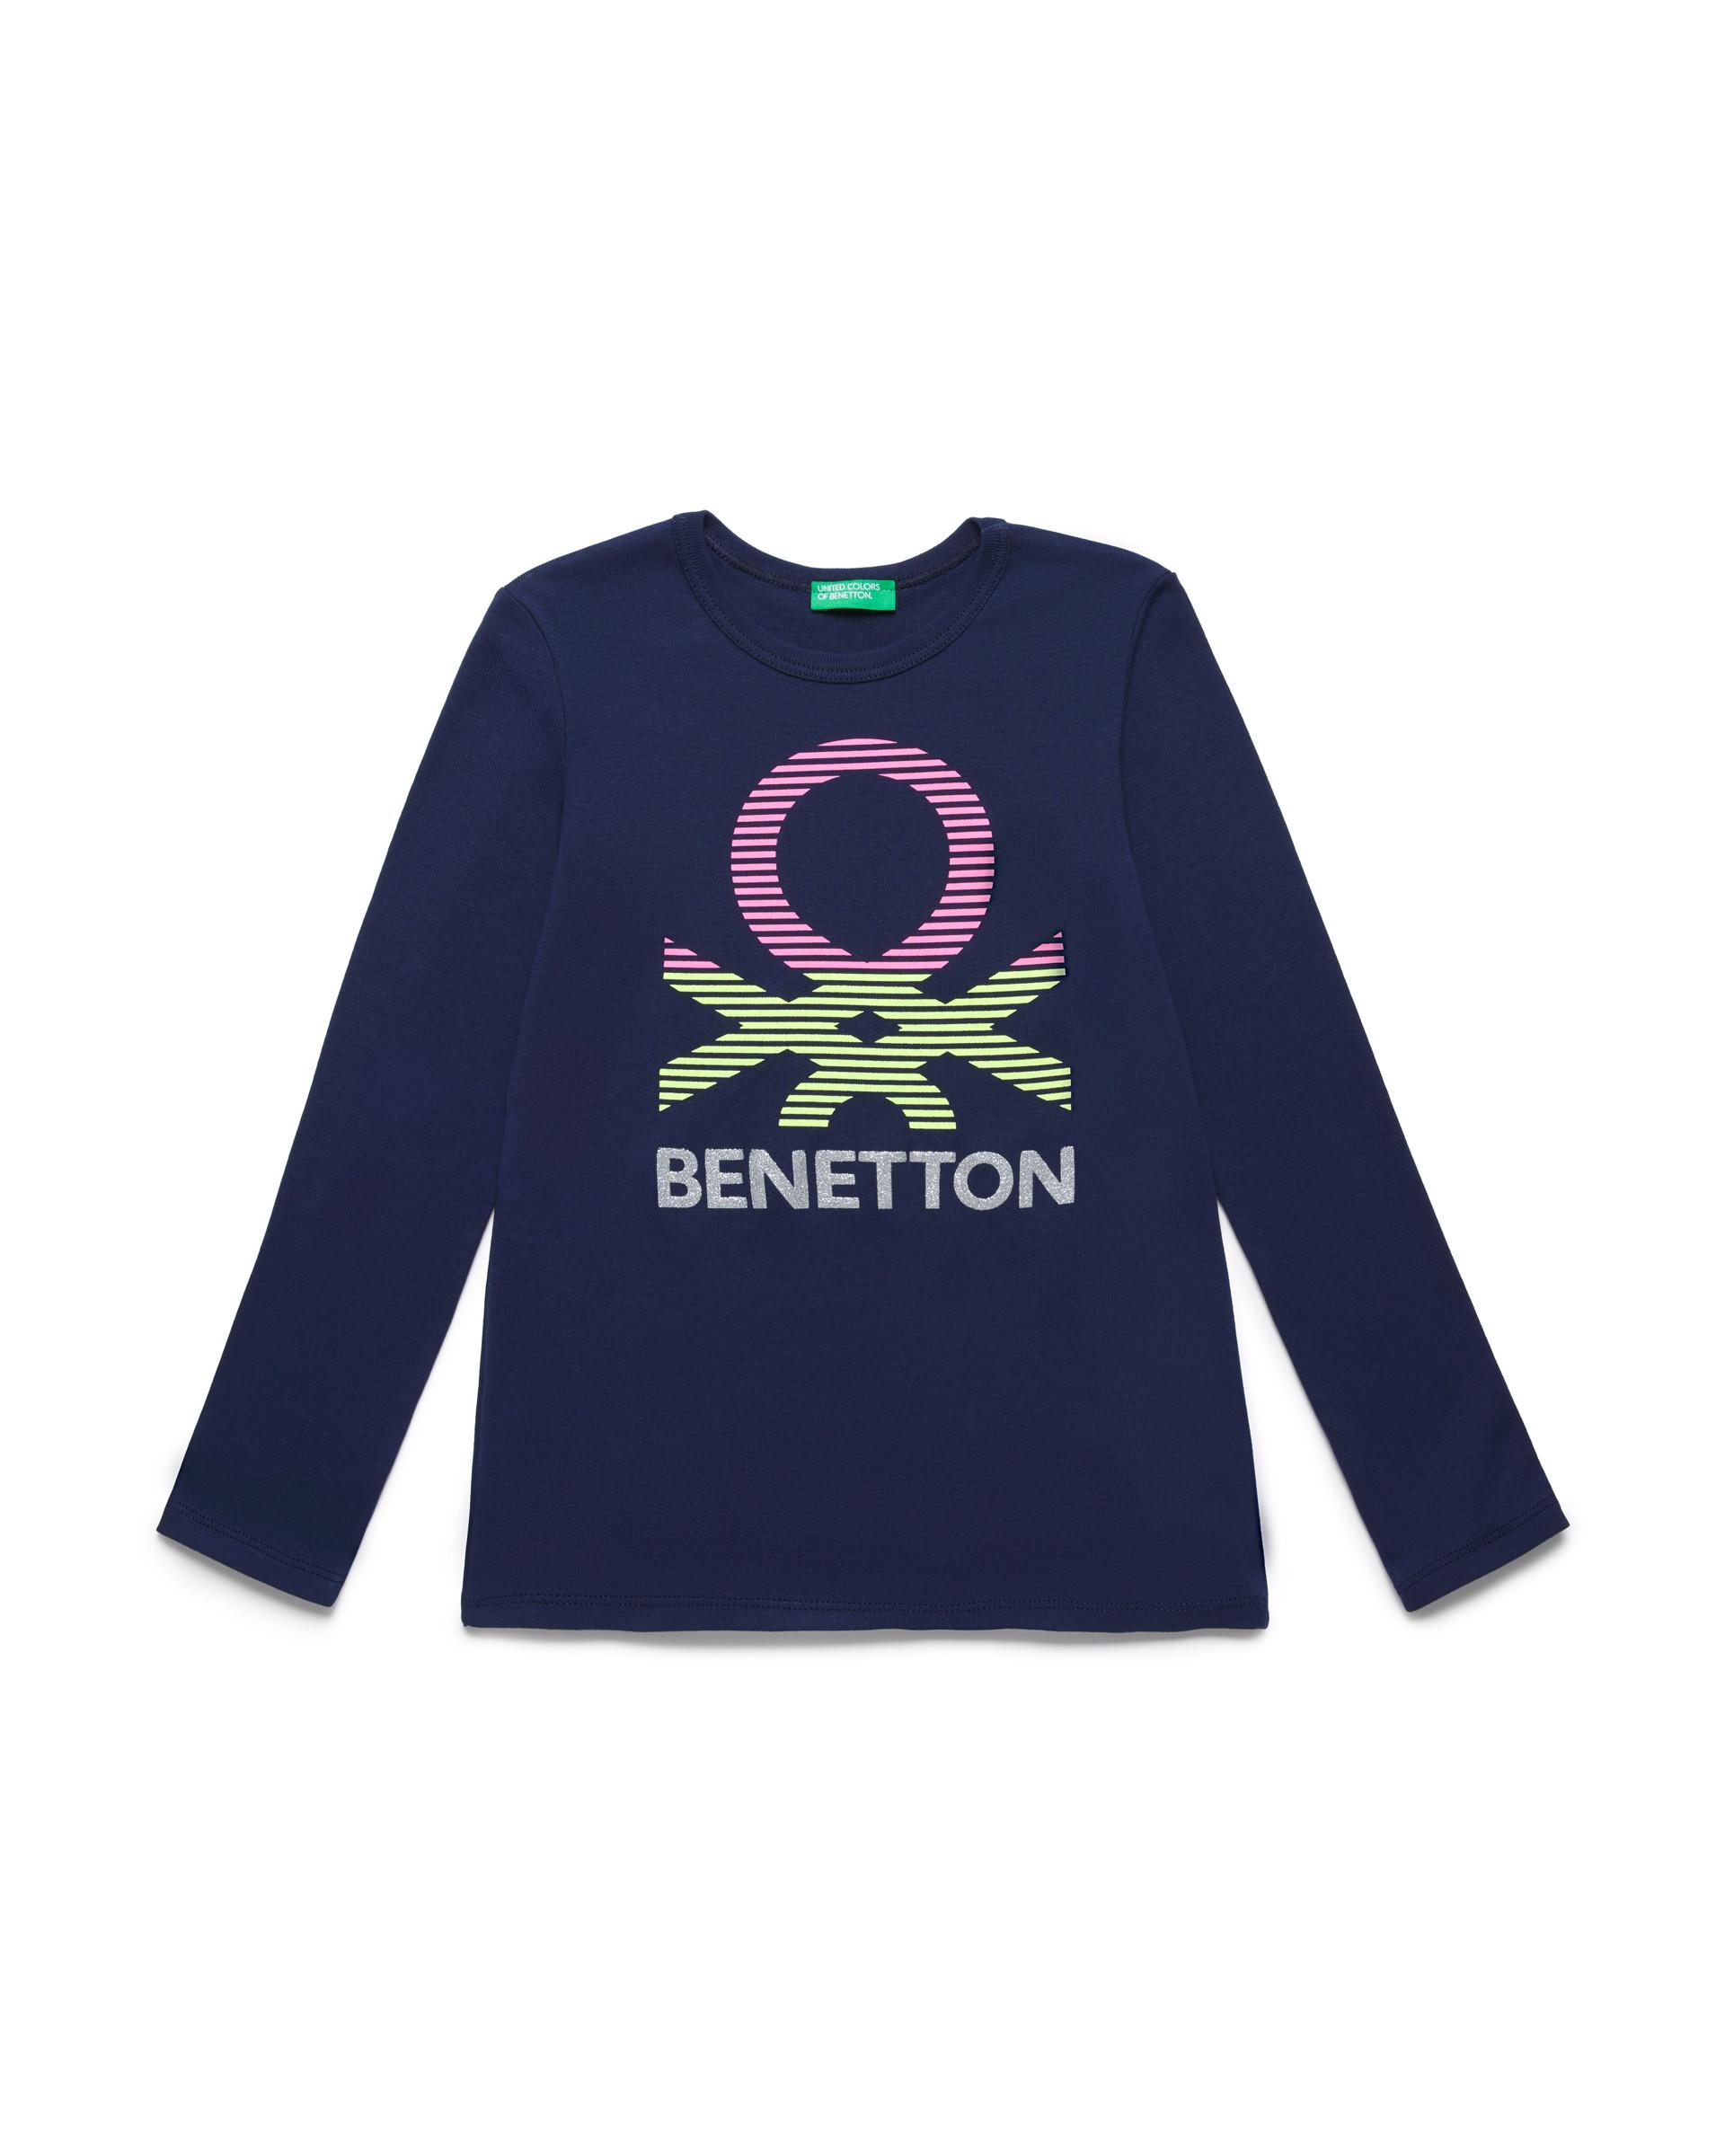 Купить 20P_3I9WC14J3_252, Футболка для девочек Benetton 3I9WC14J3_252 р-р 140, United Colors of Benetton, Футболки для девочек